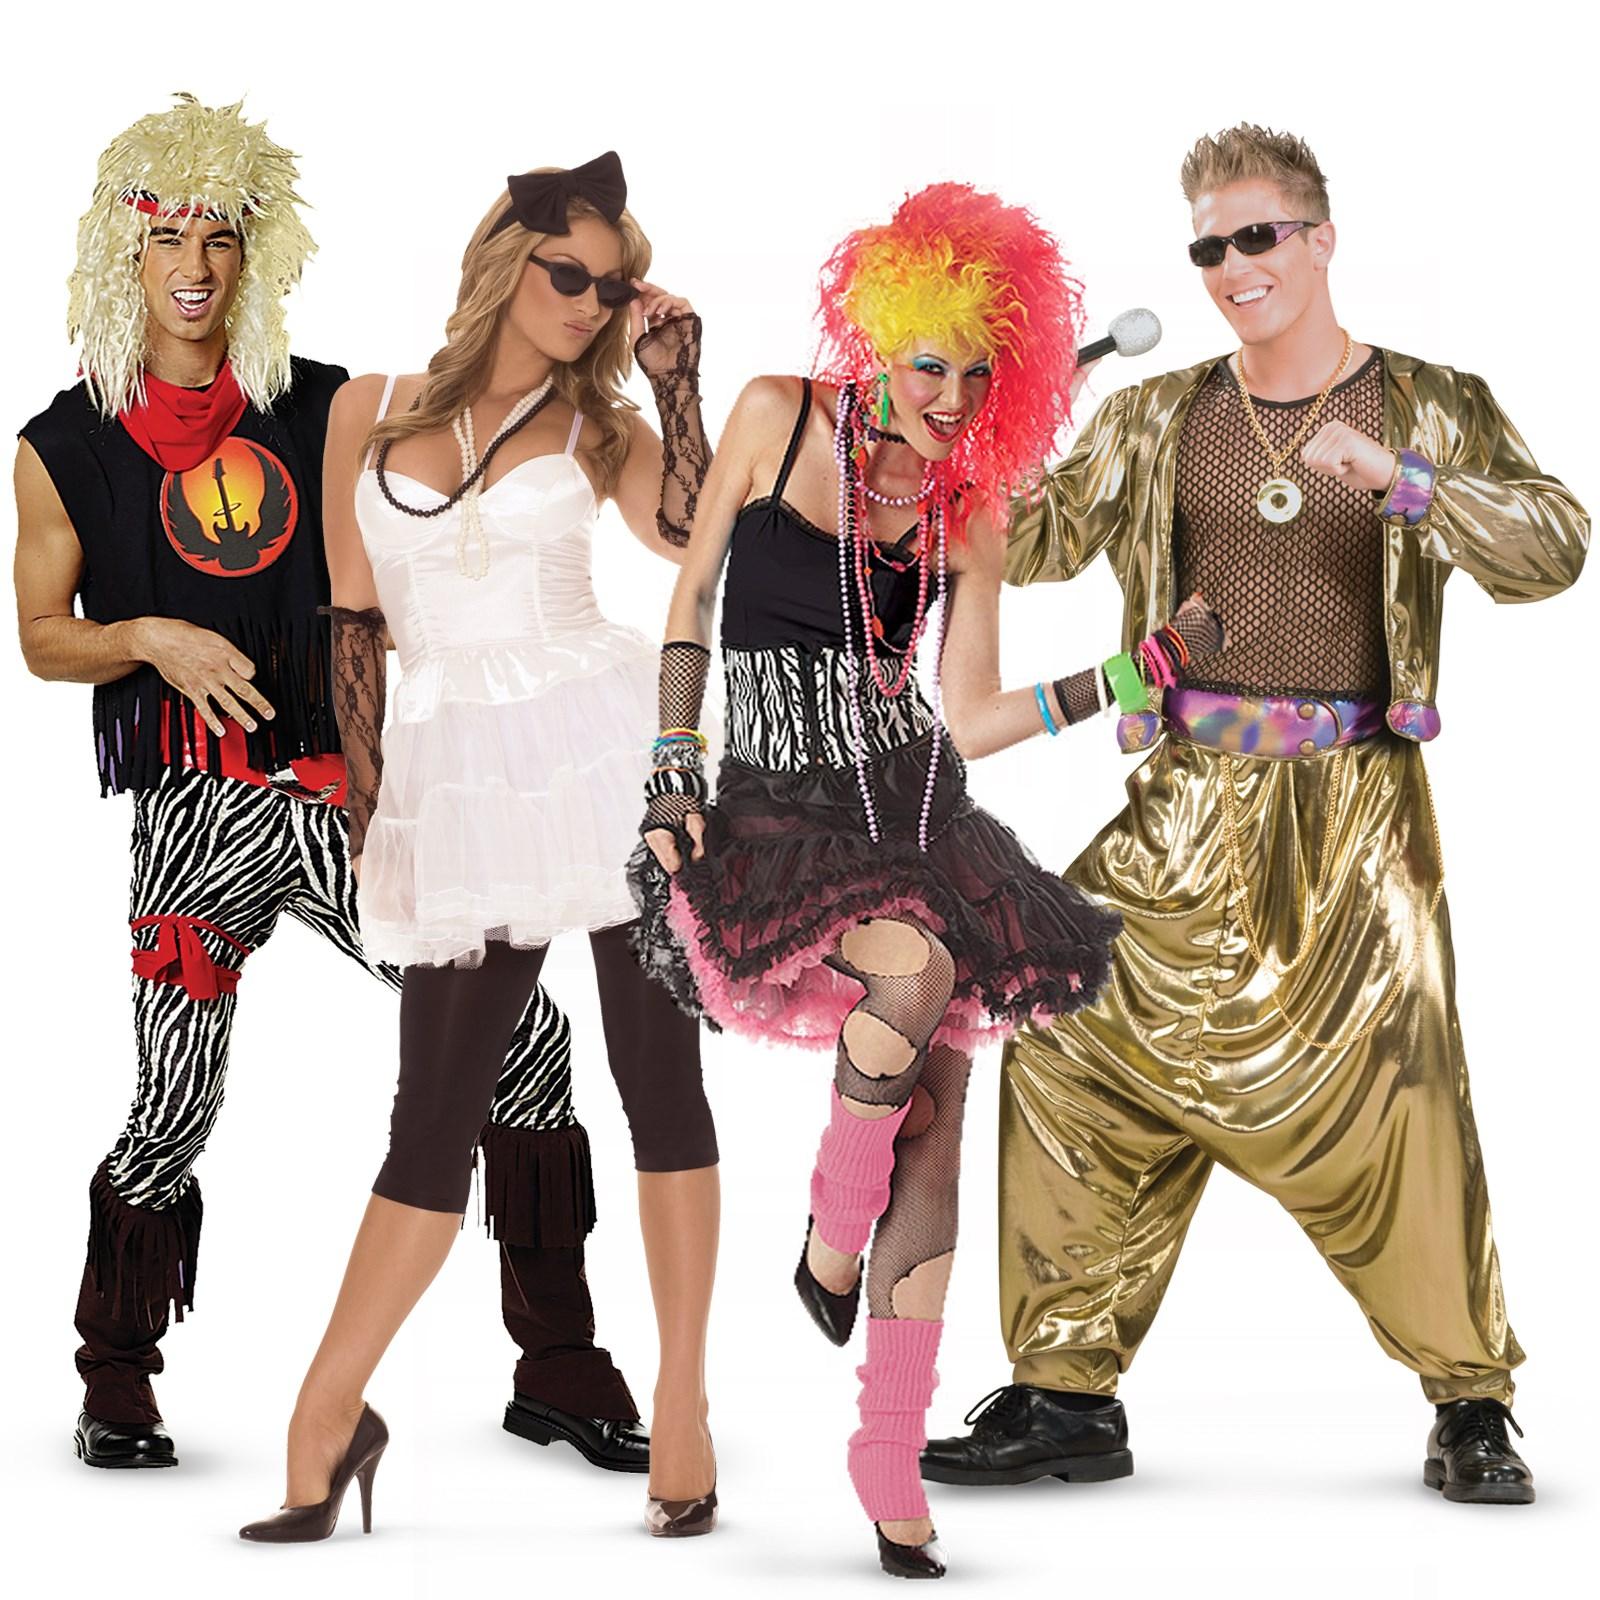 80's Rockstars Group Costumes   BuyCostumes.com